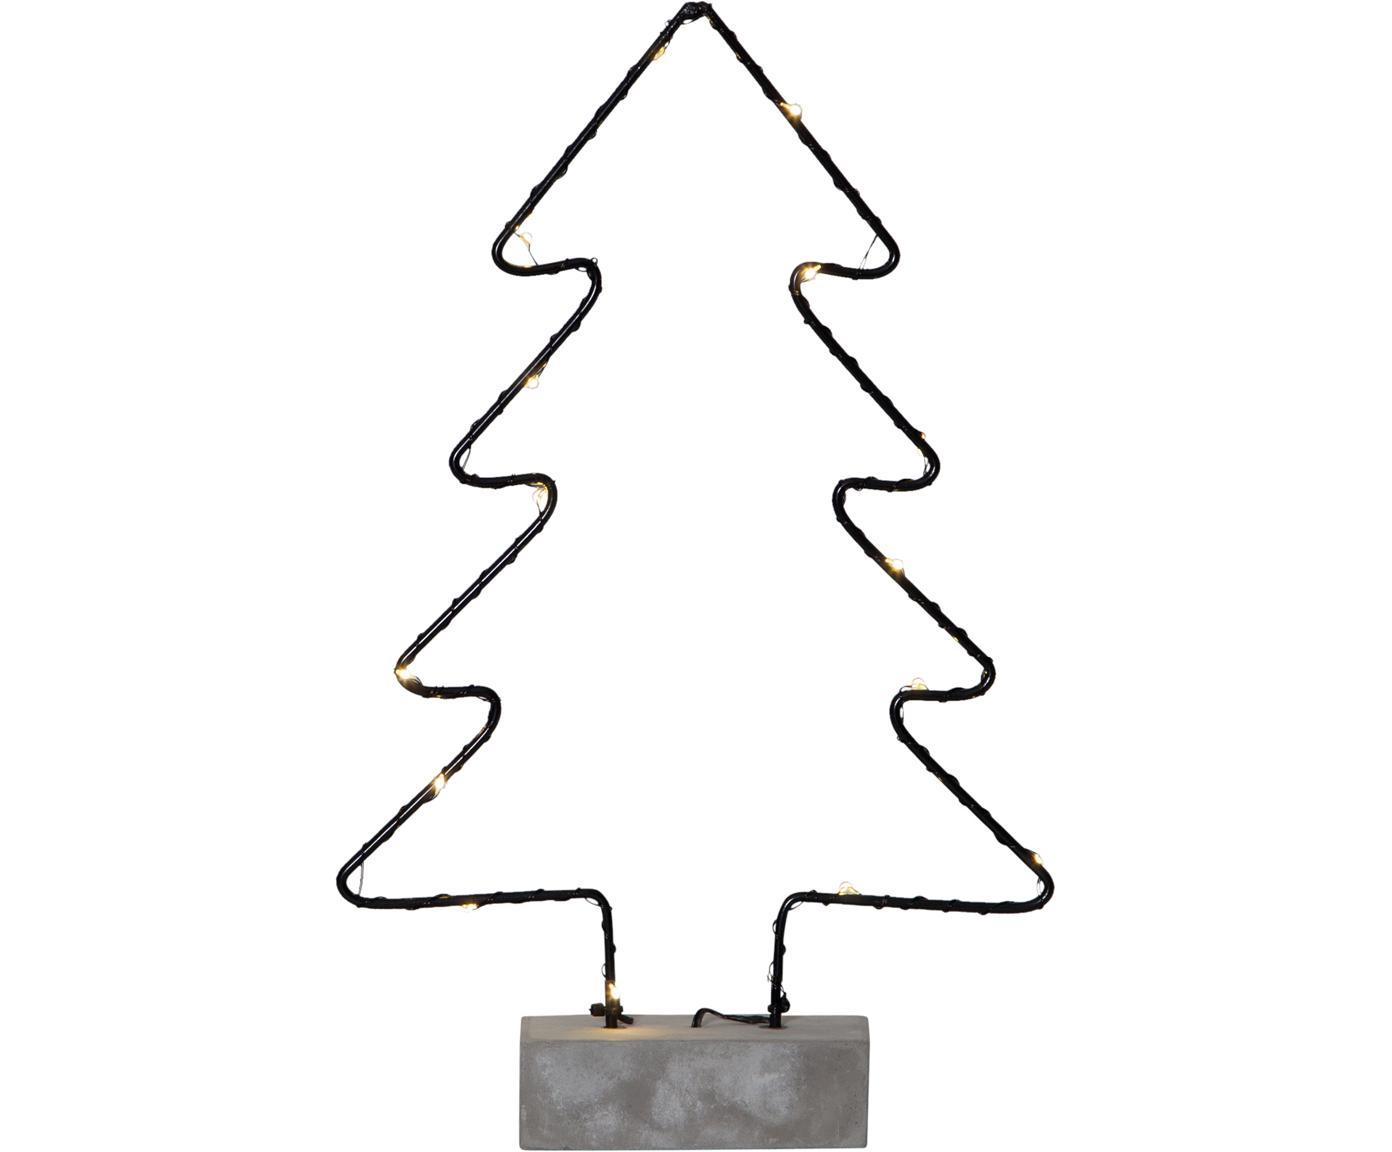 LED lichtobject Cemmy, batterij-aangedreven, Voetstuk: beton, Zwart, betongrijs, 23 x 35 cm